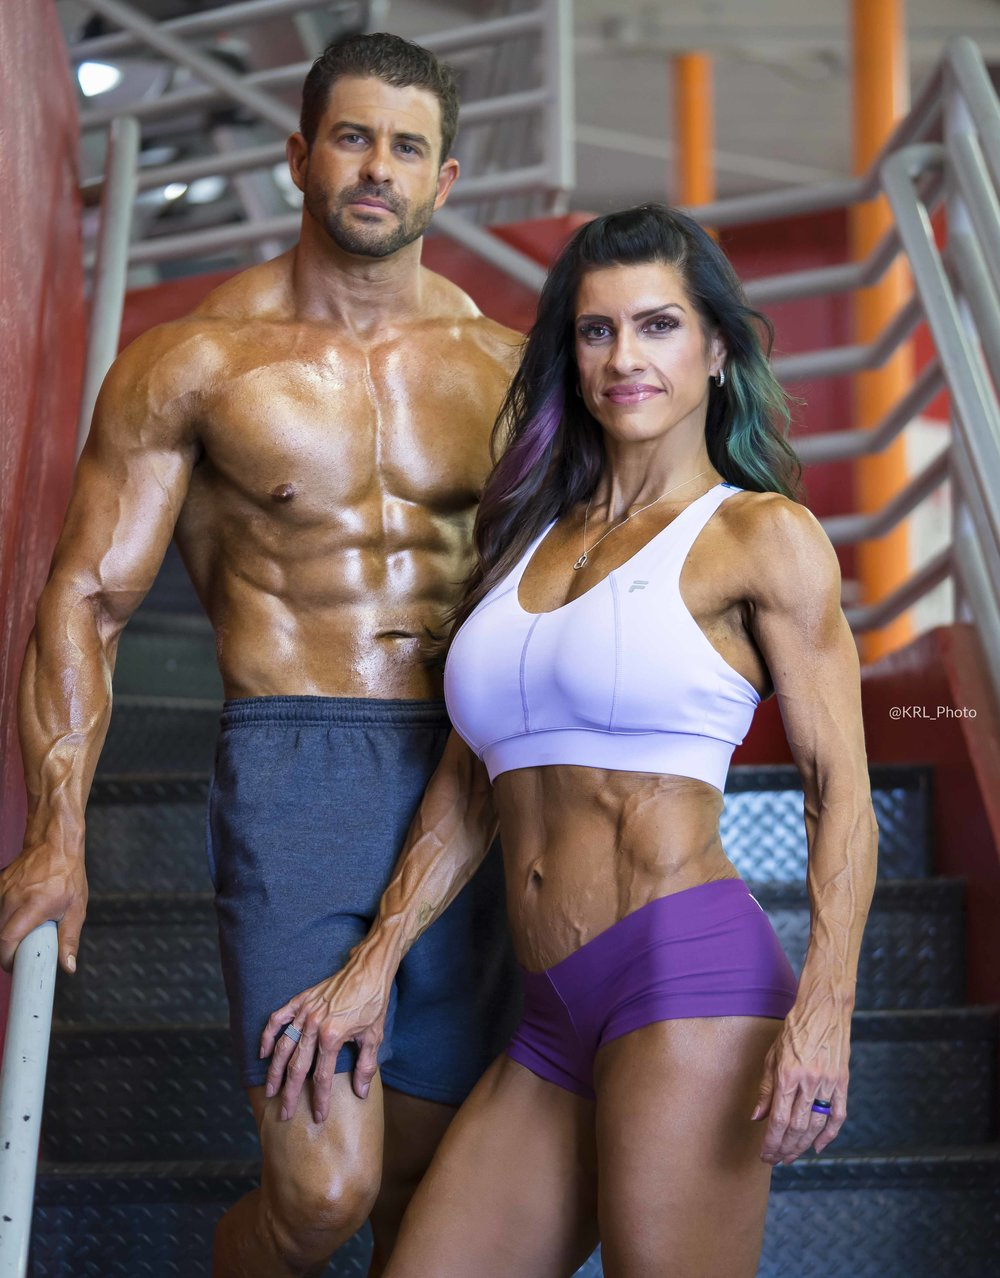 Gym Couple.jpg